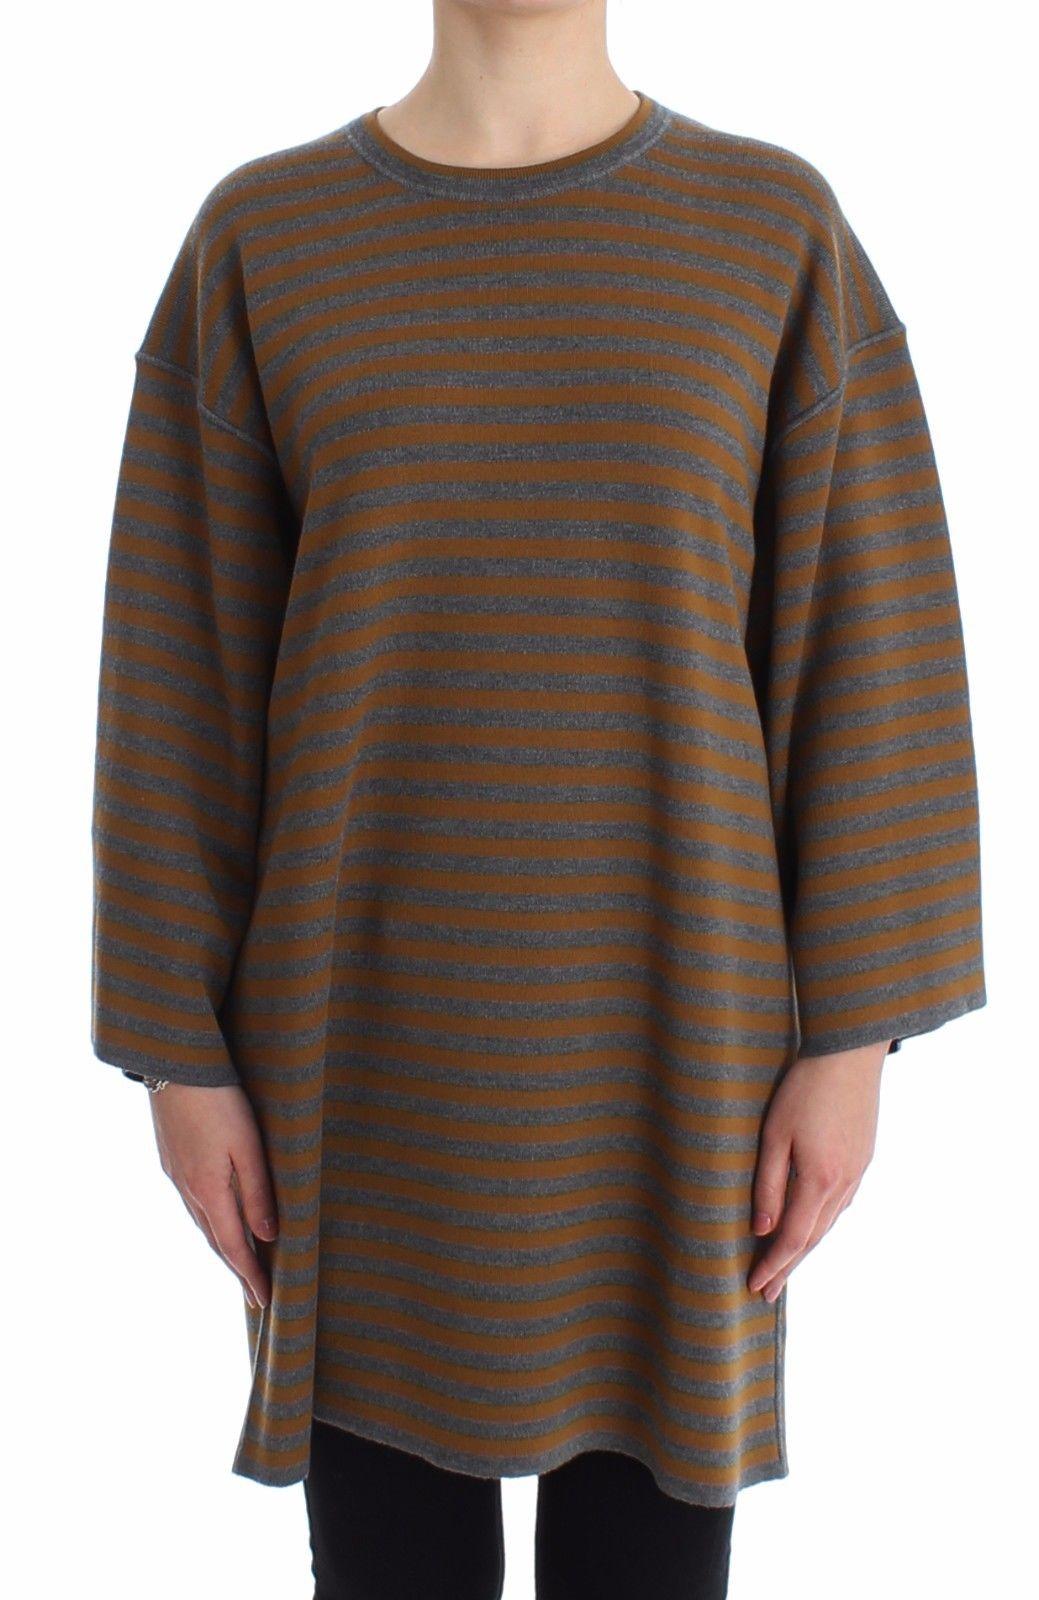 Dolce & Gabbana Women's Oversized Striped Top Gray SIG13232 - IT40  L